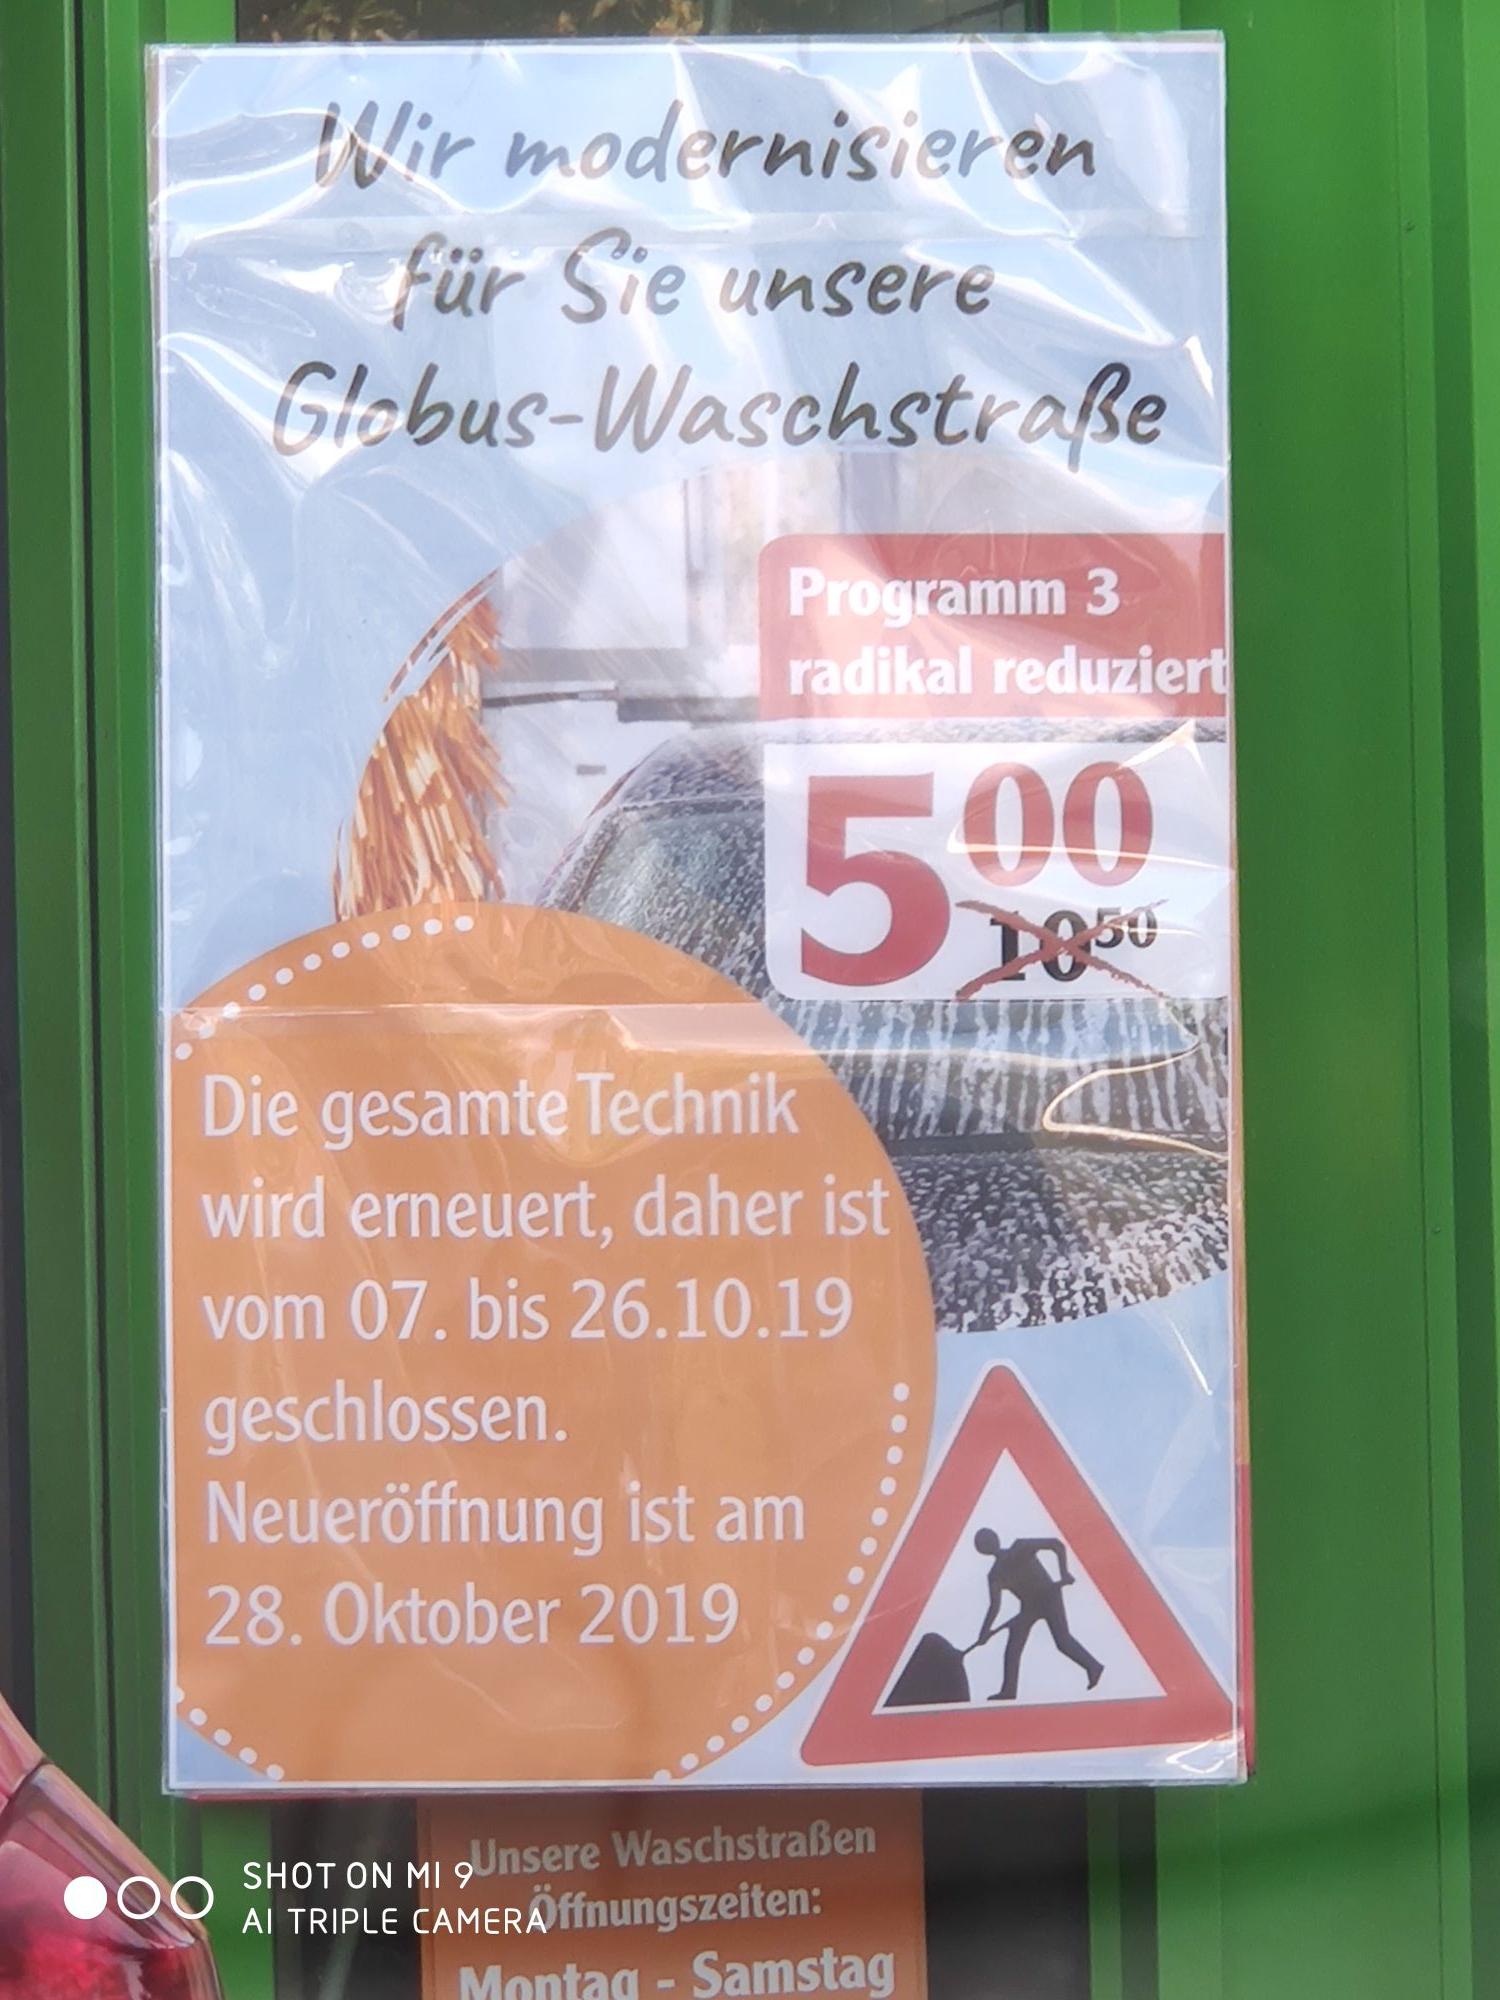 [Lokal] Globus Köln Marsdorf - Autowäsche für 5 €